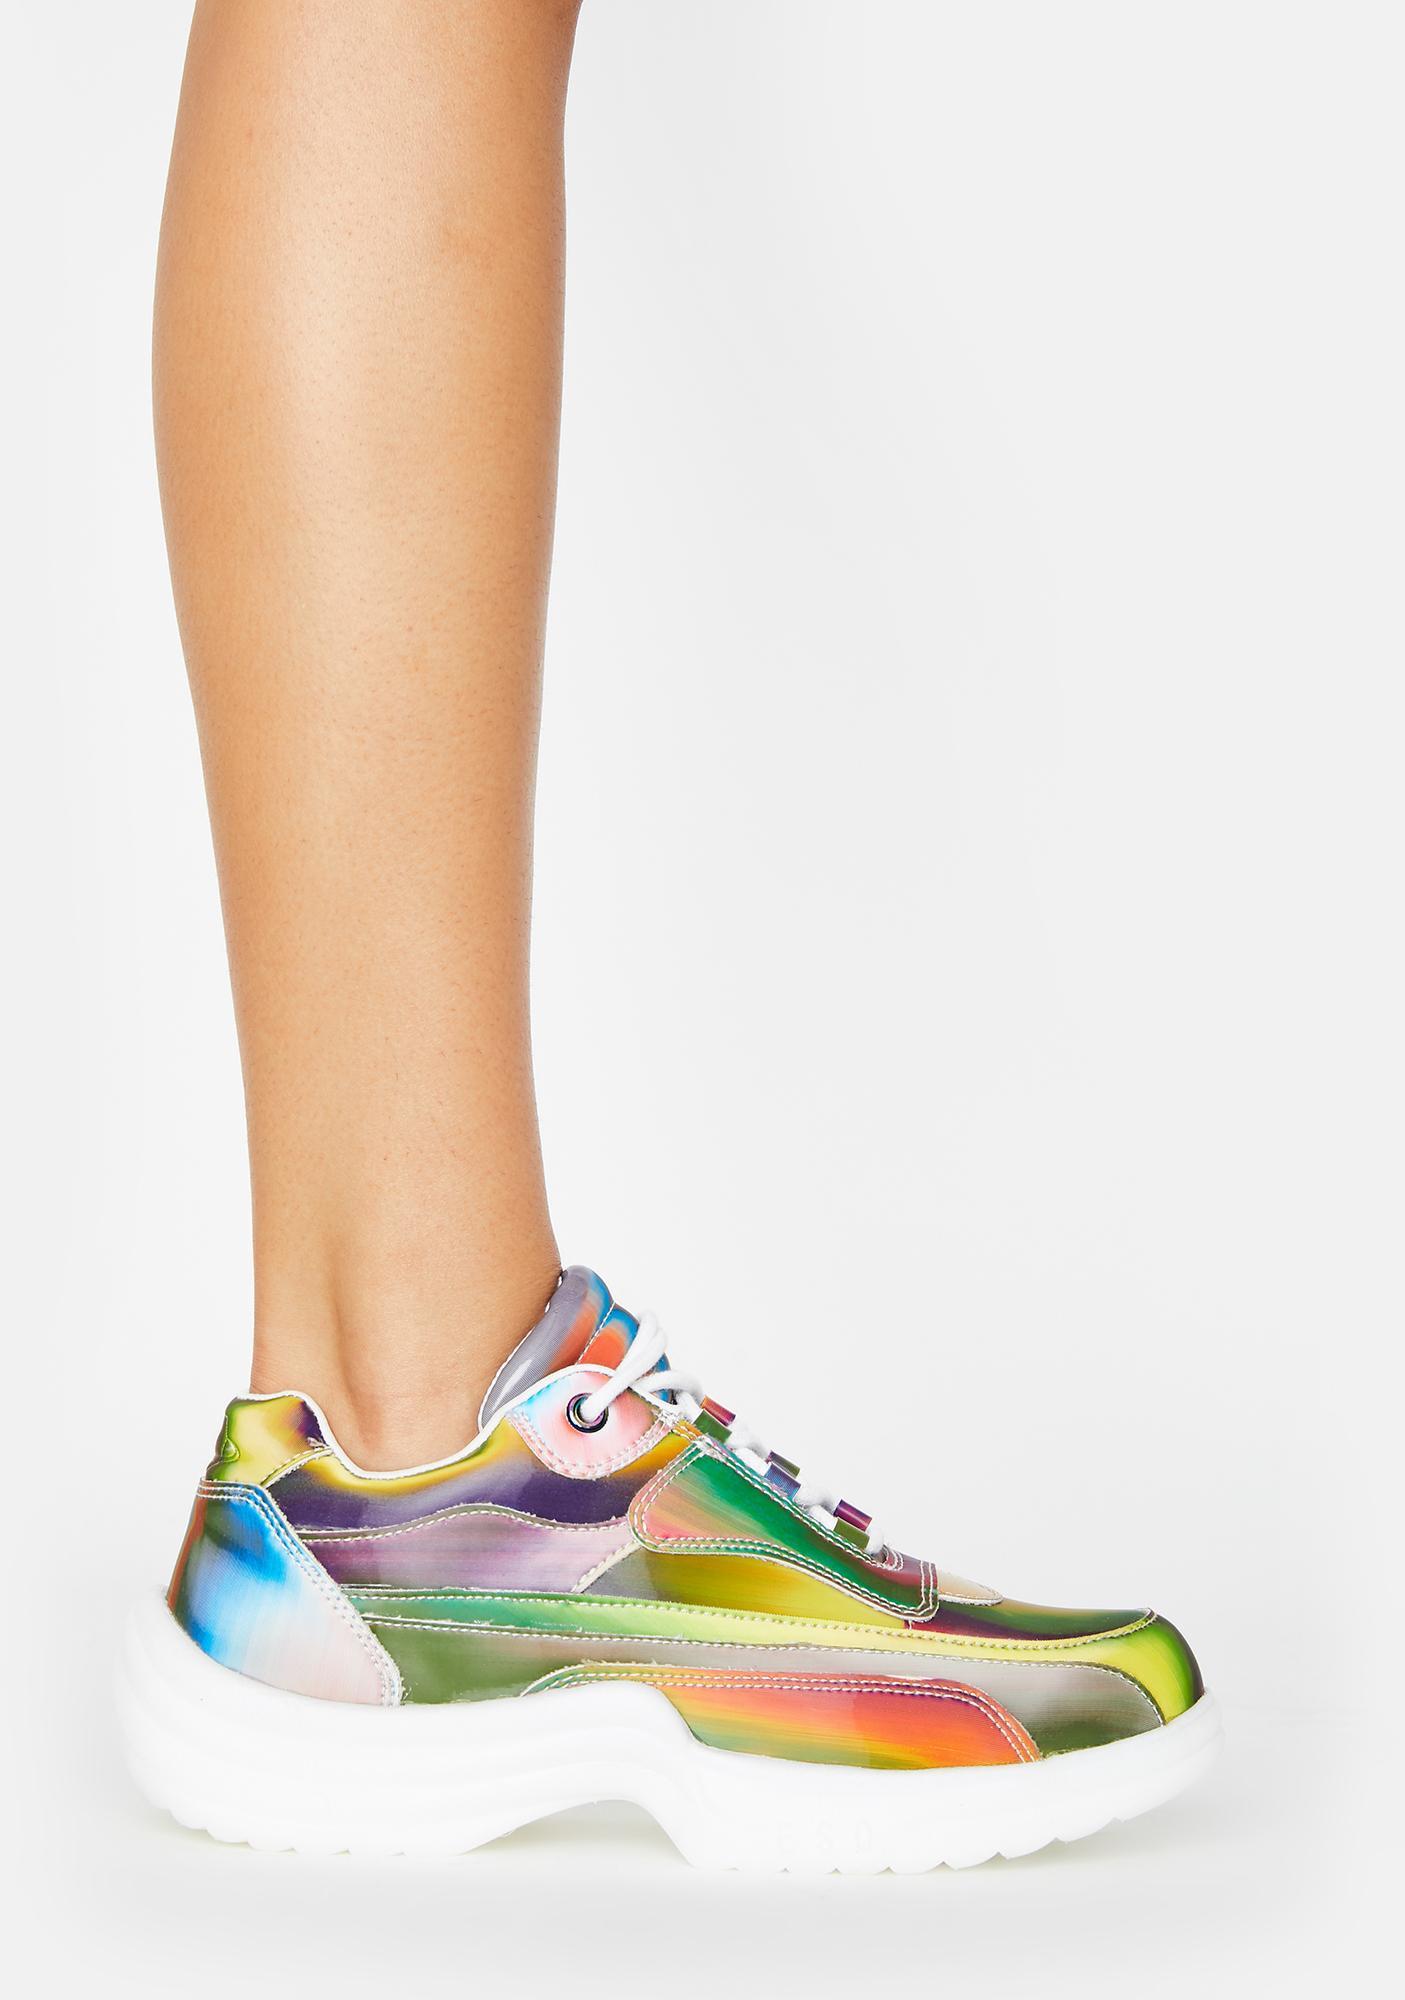 ESQAPE 5D Transcending Flyh Lo Sneakers